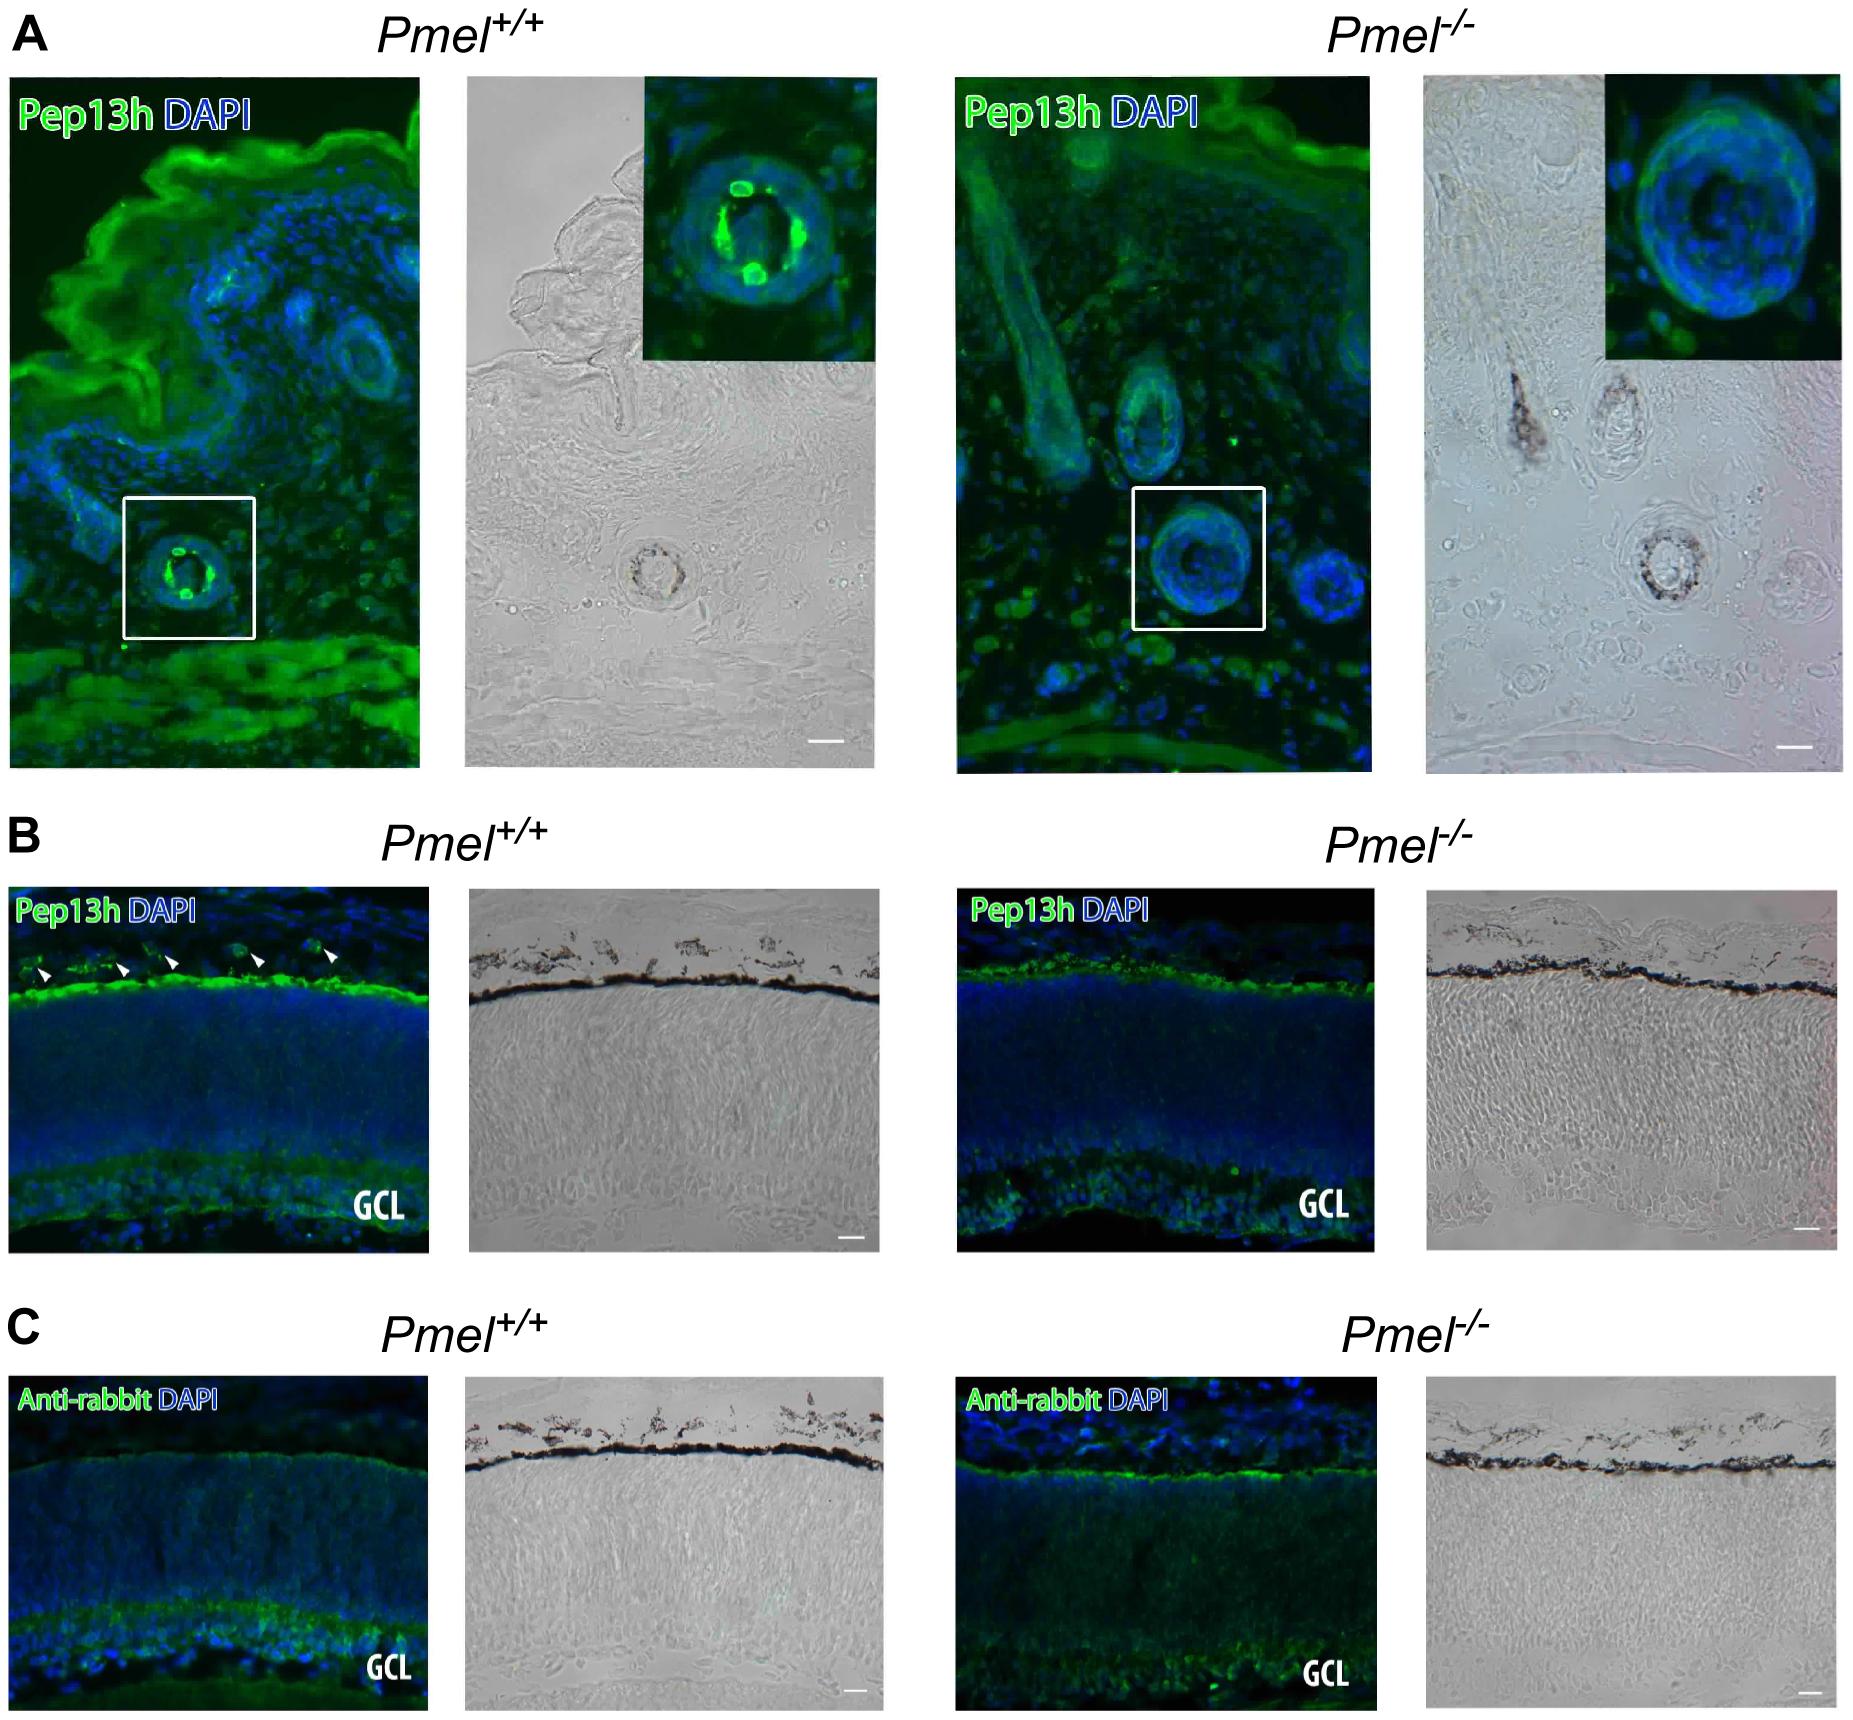 Immunohistochemistry of skin and retina from <i>Pmel<sup>+/+</sup></i>and <i>Pmel<sup>−/−</sup> </i>mice.